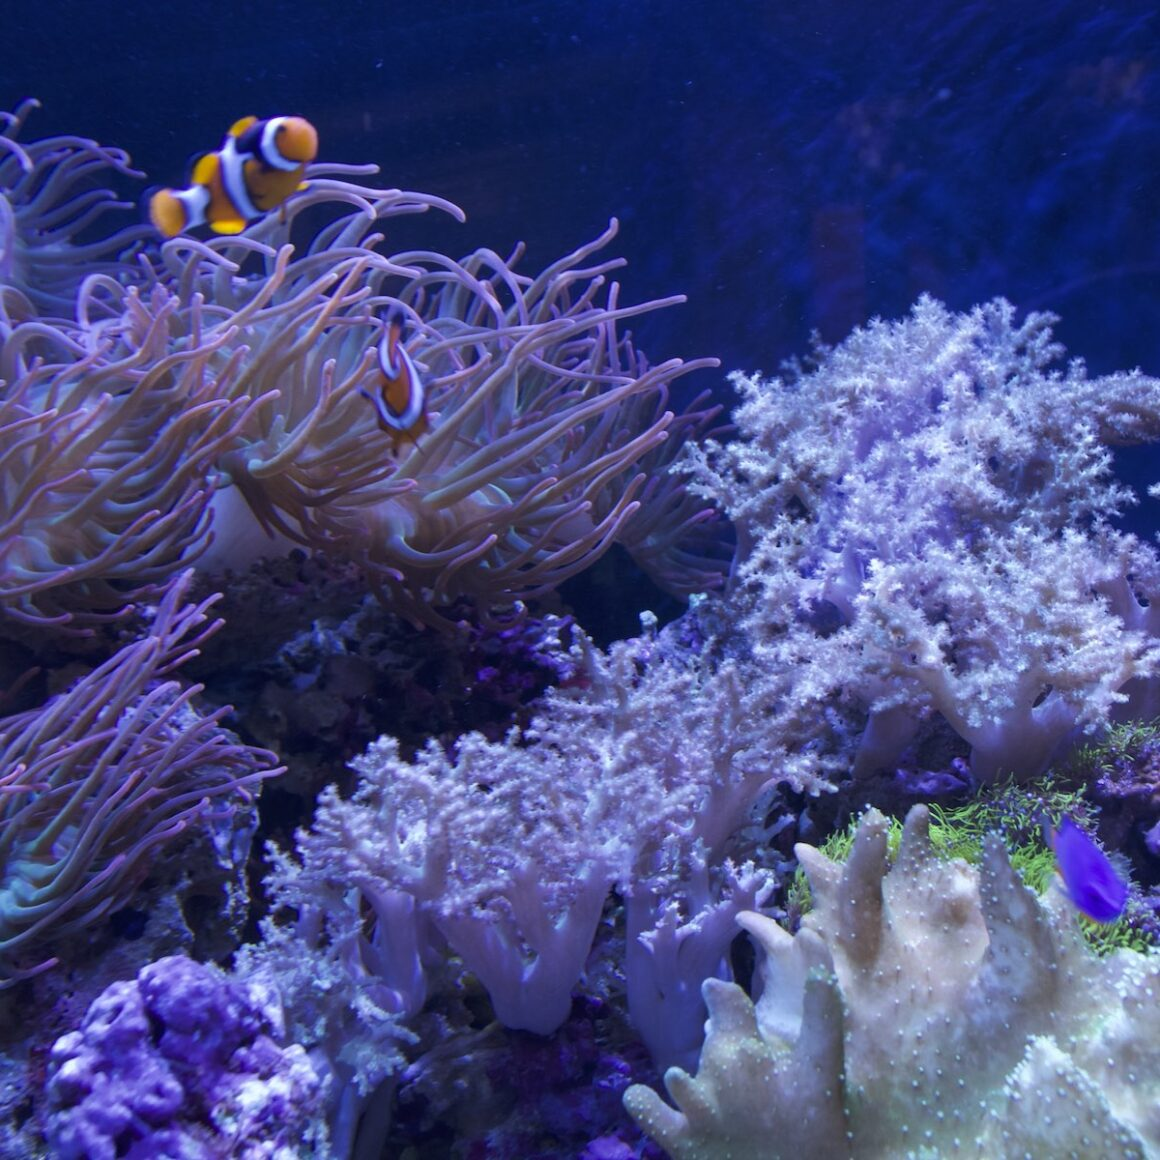 aquarium shop san diego with coral reef and clown fish